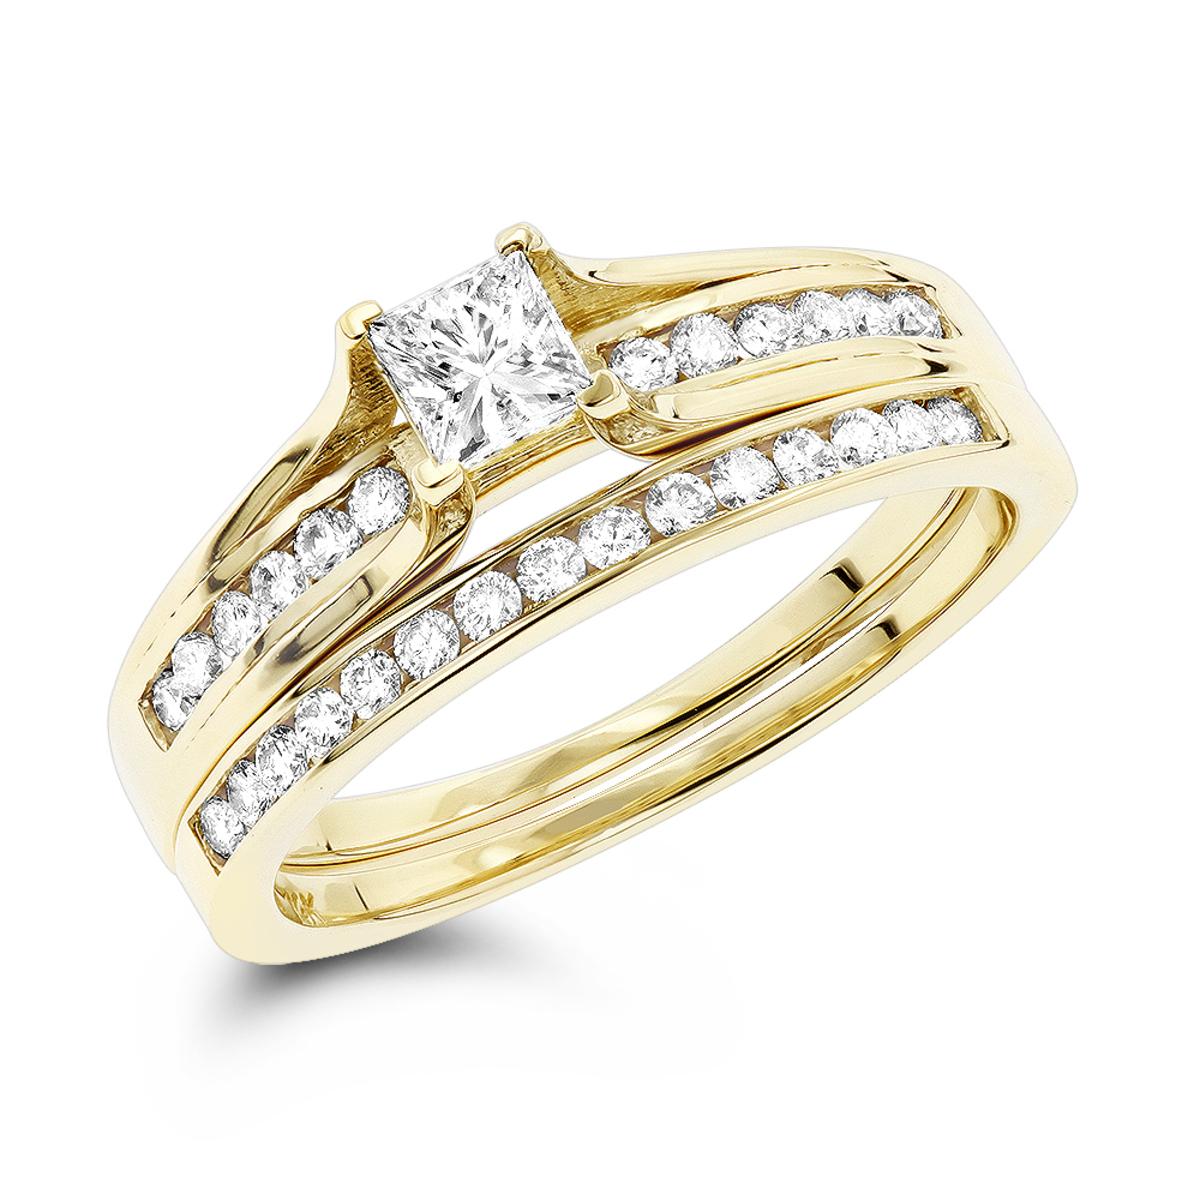 14K Gold Round and Princess Cut Diamond Engagement Ring Set 1.15ct